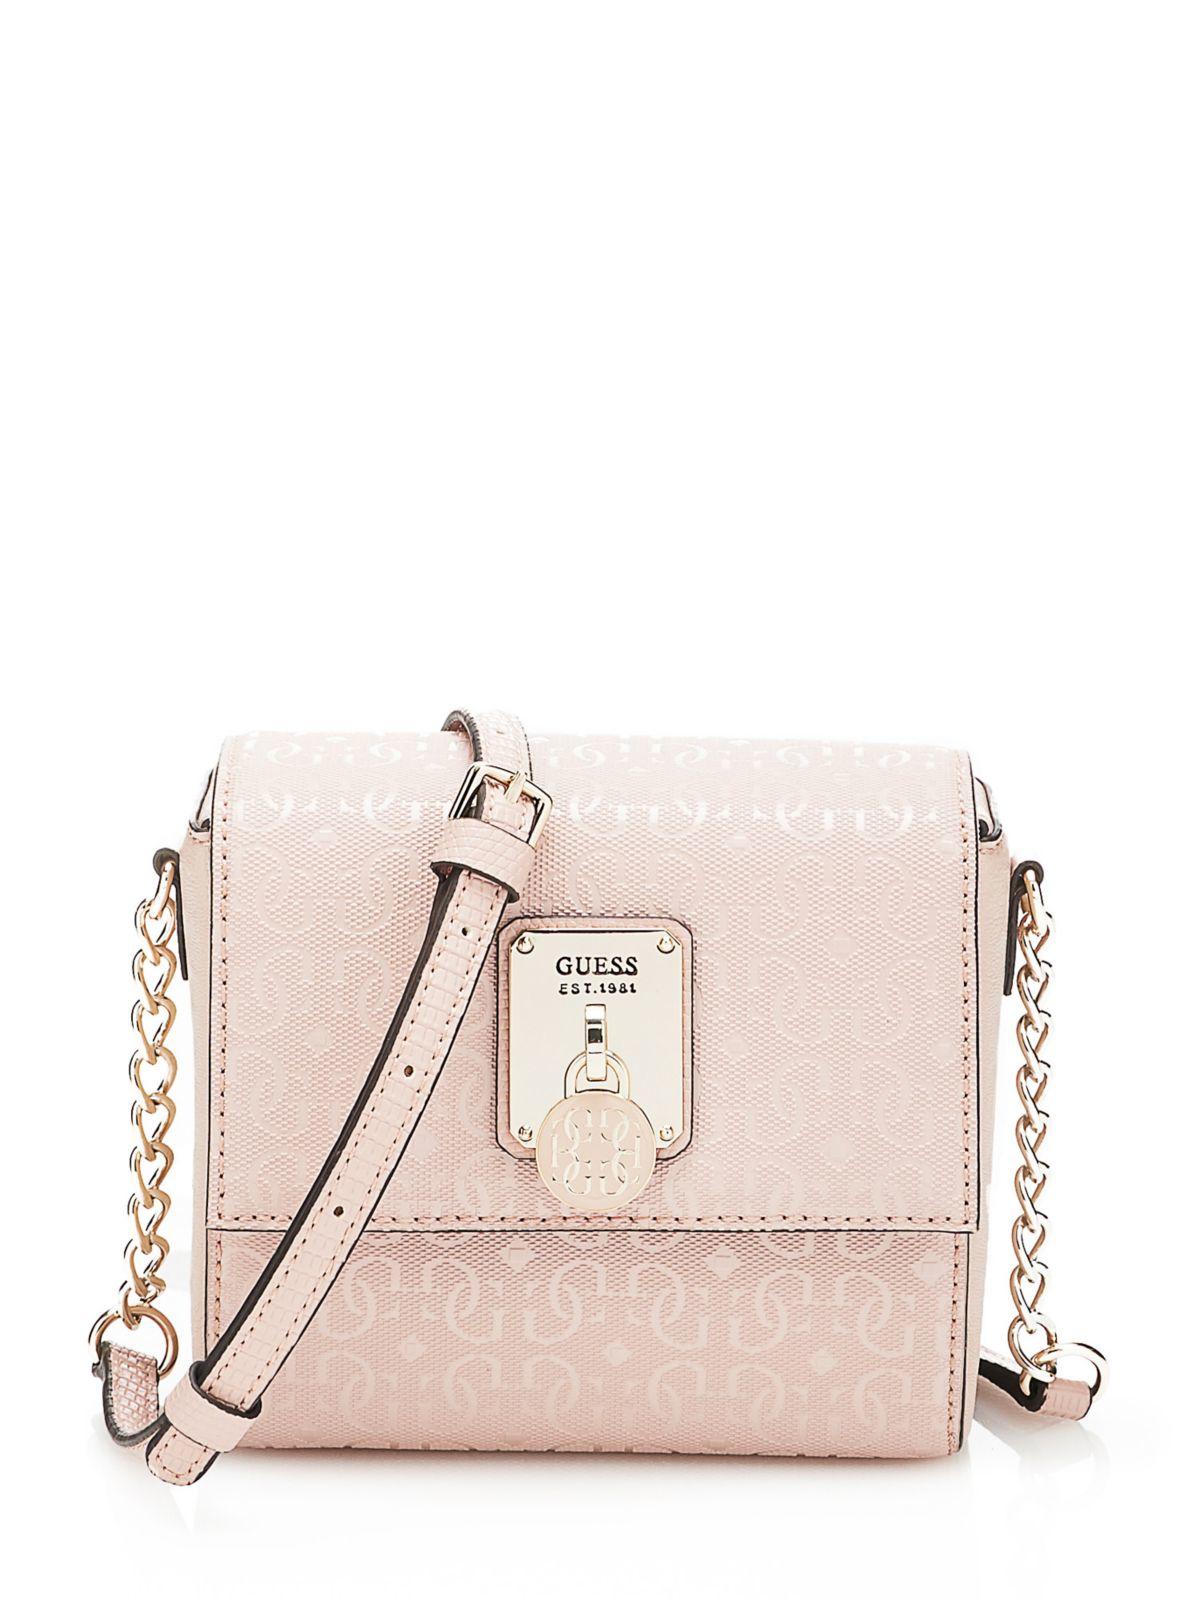 Guess Crossbody Tassen : Guess rosalind mini crossbody bag in pink lyst